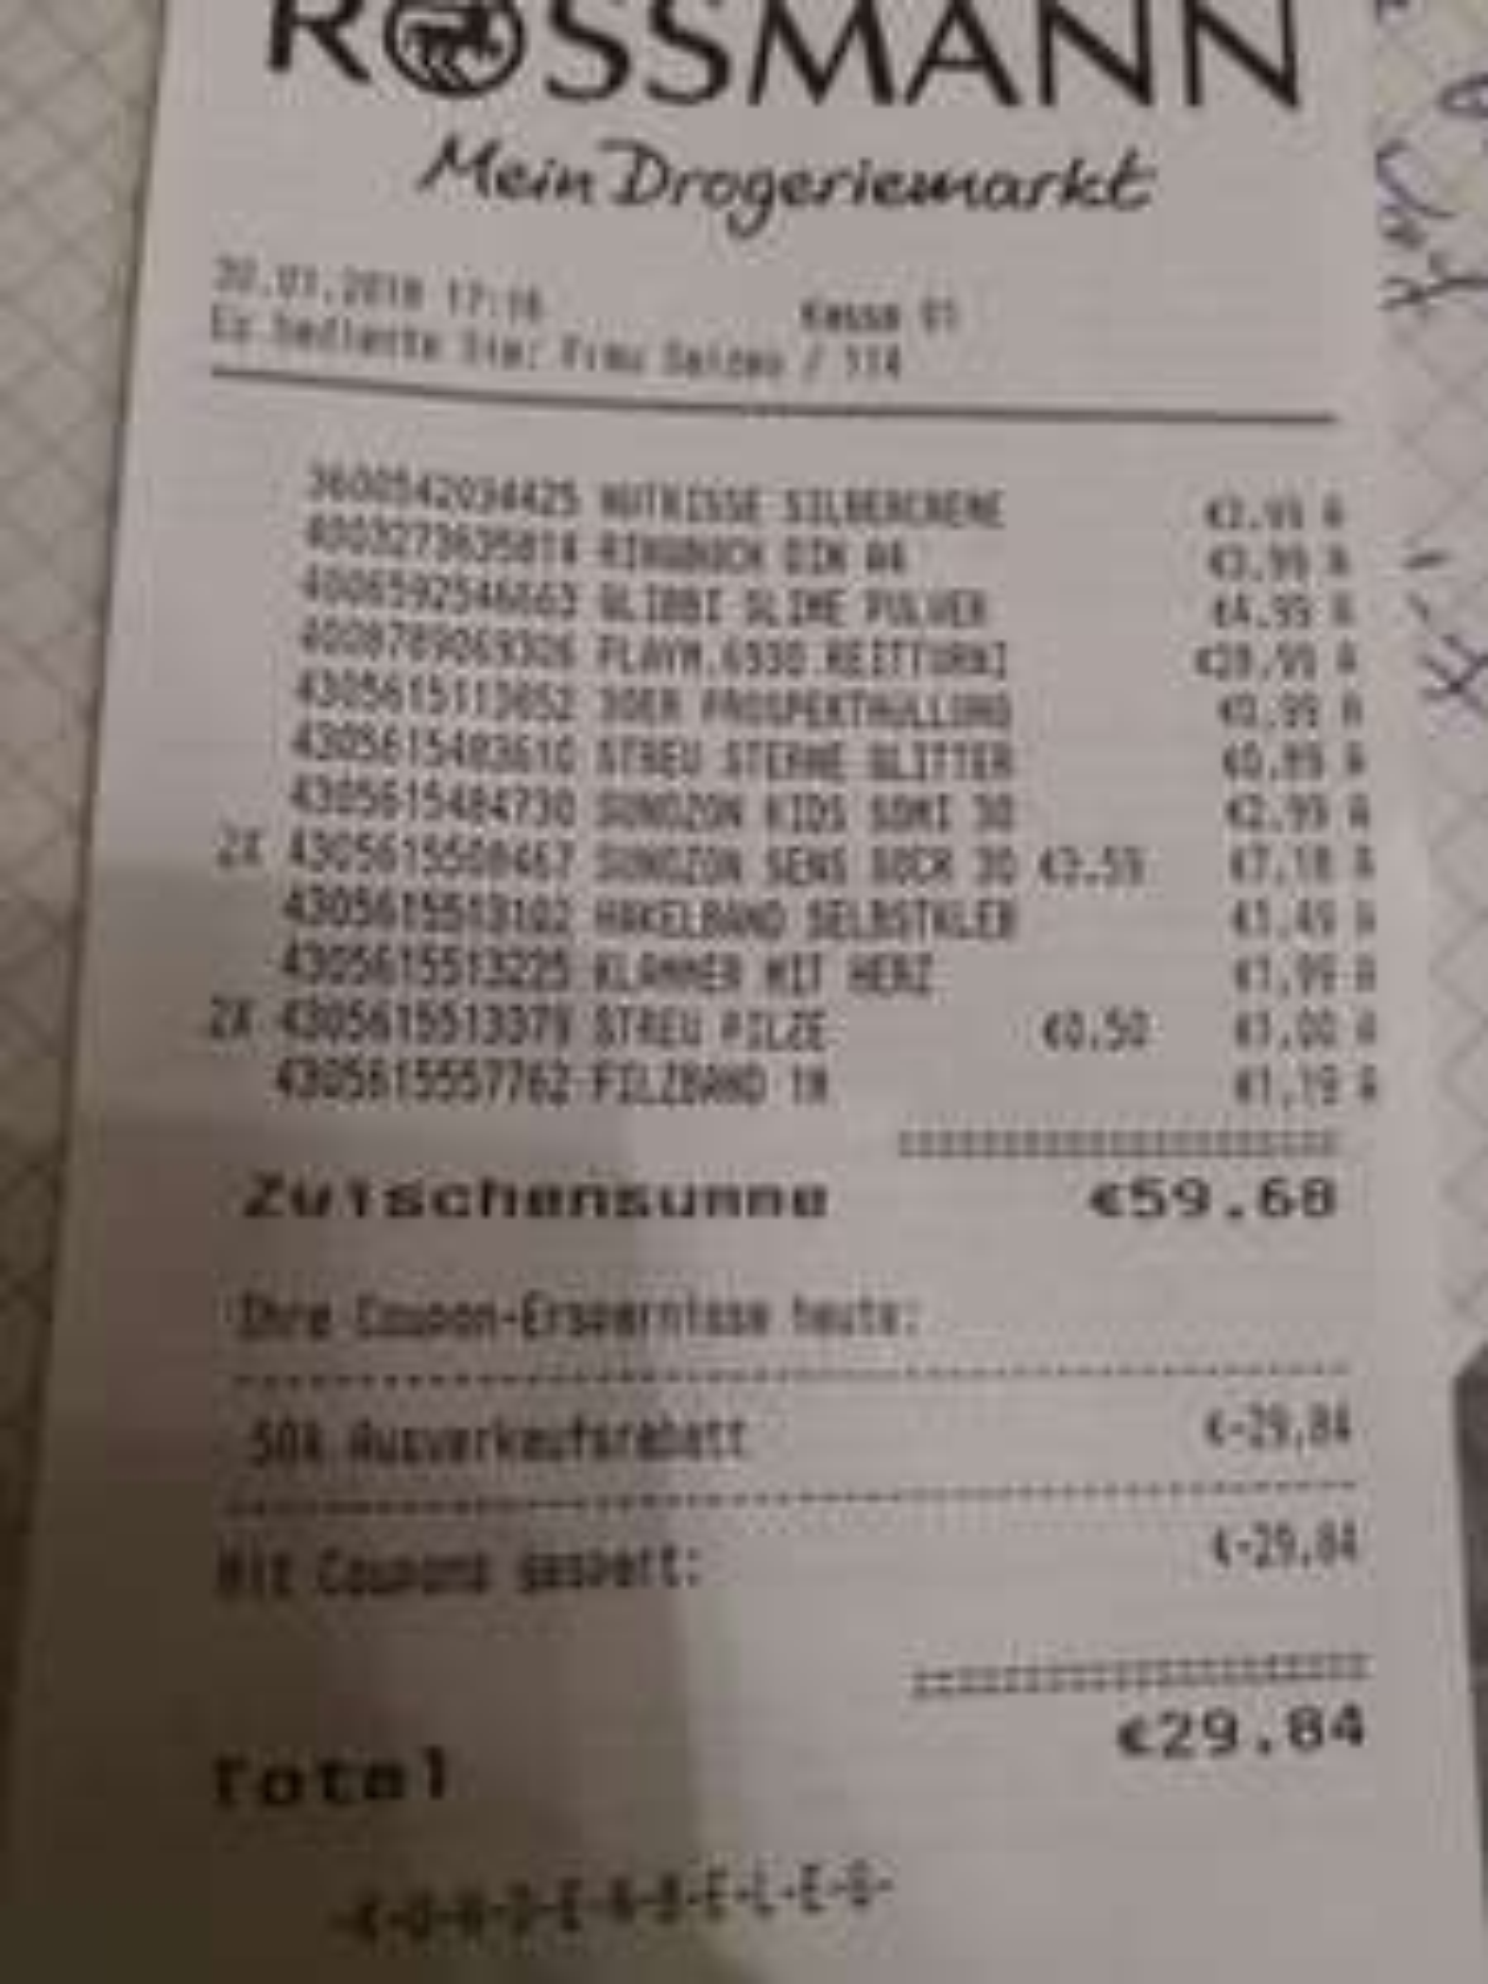 (Lokal) Rossmann 50% auf alles